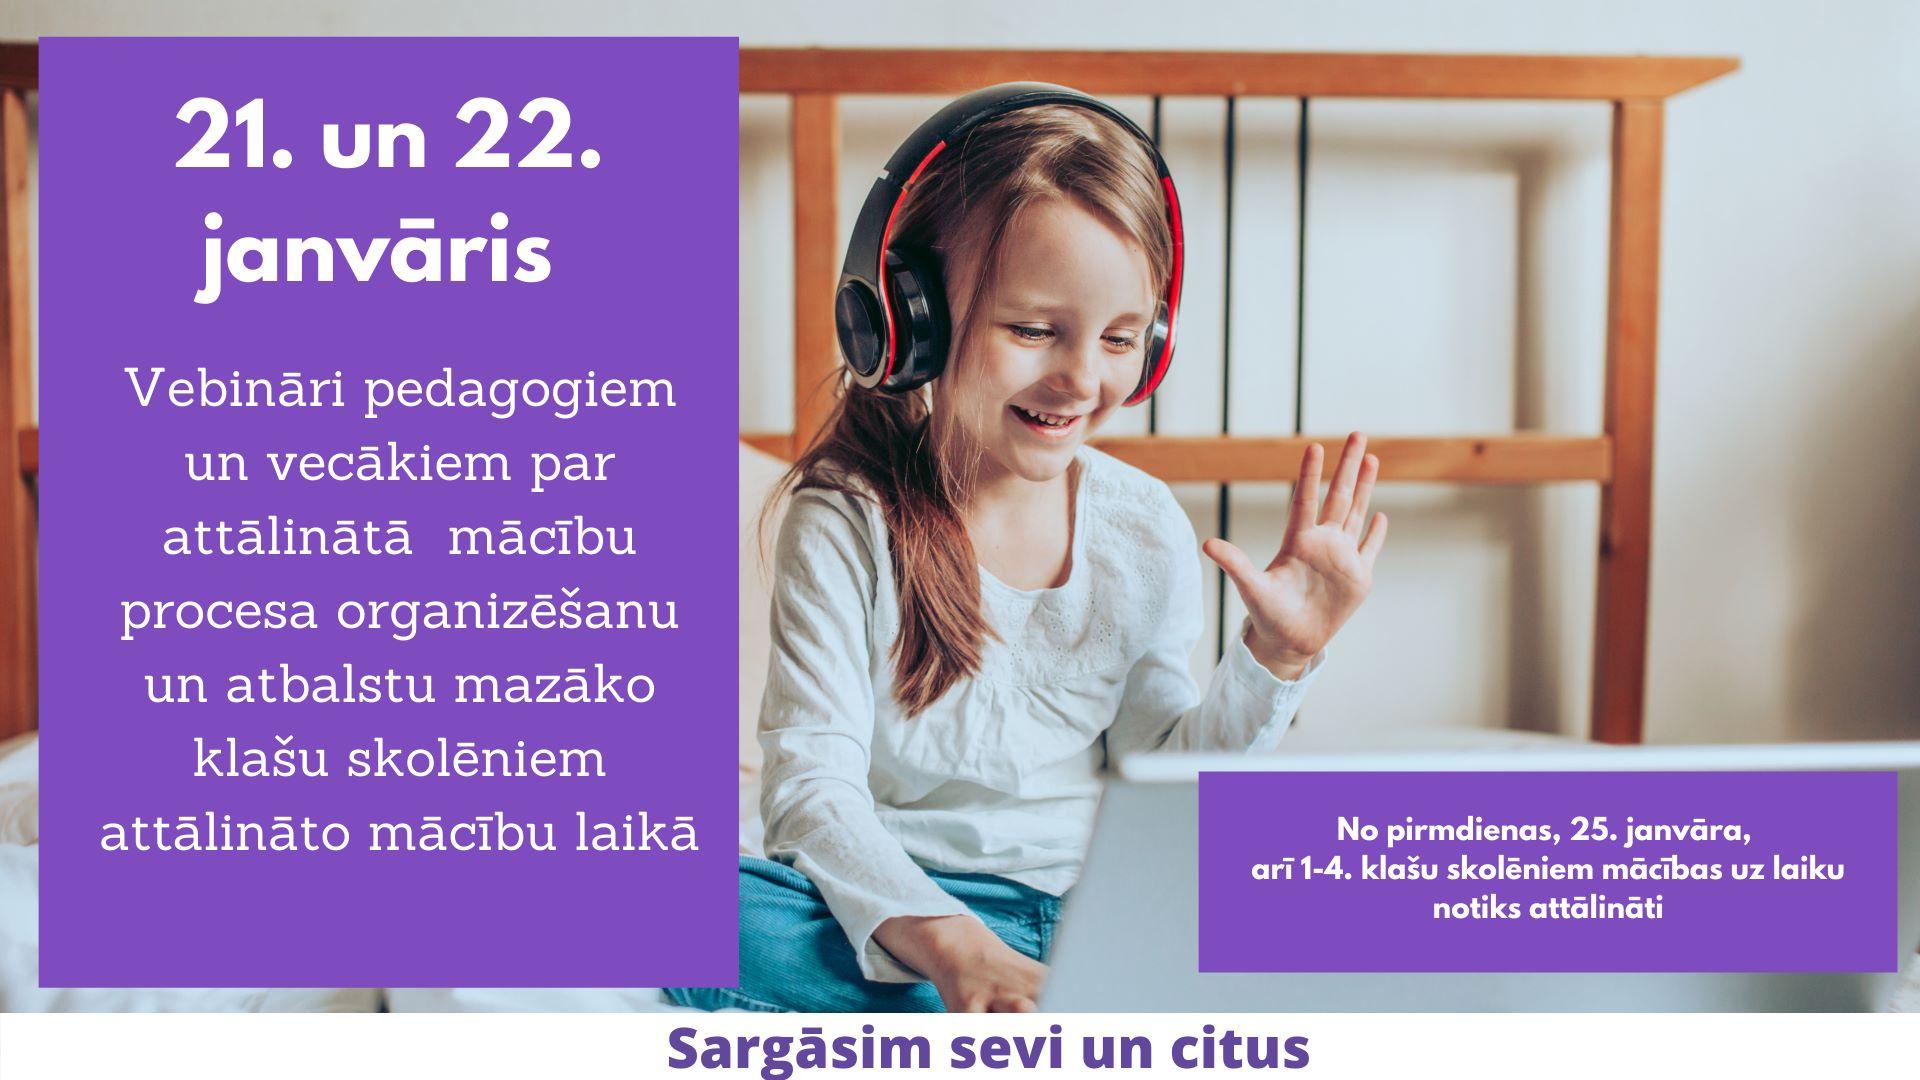 attalinatas-macibas-1-4